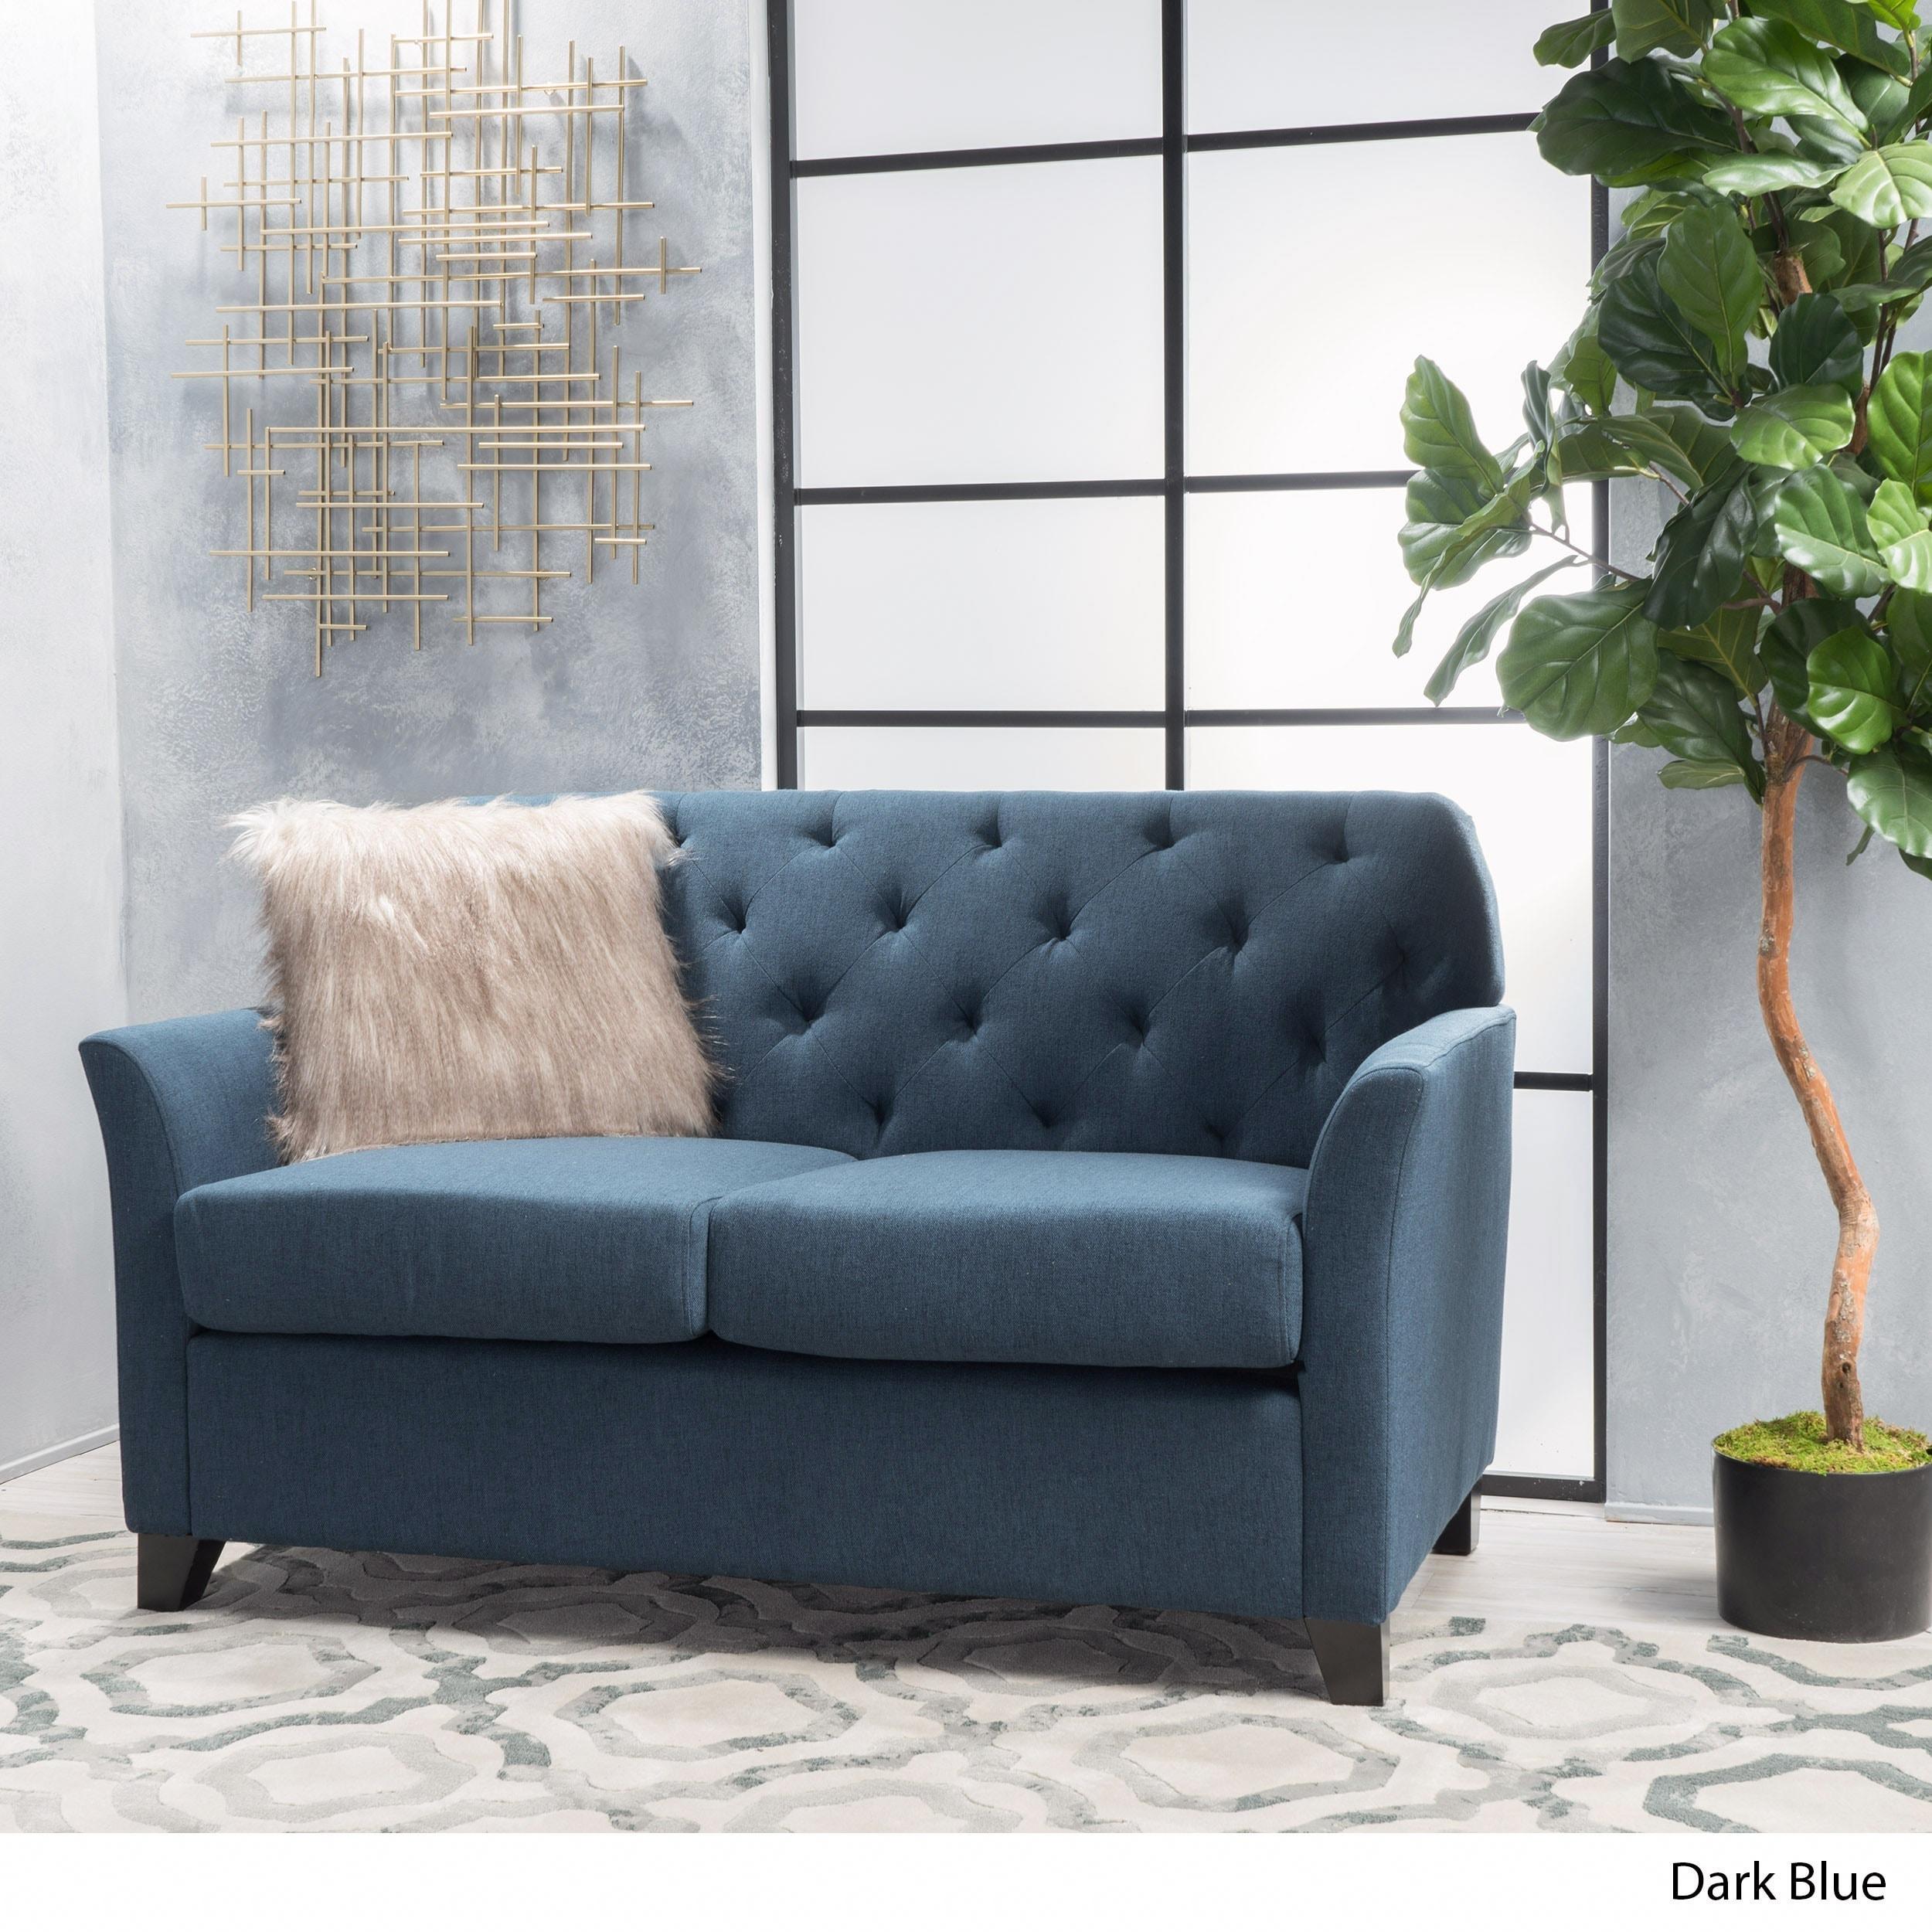 julia by you chair set and ottoman fabric aqua stressless htm karma loveseat sofa